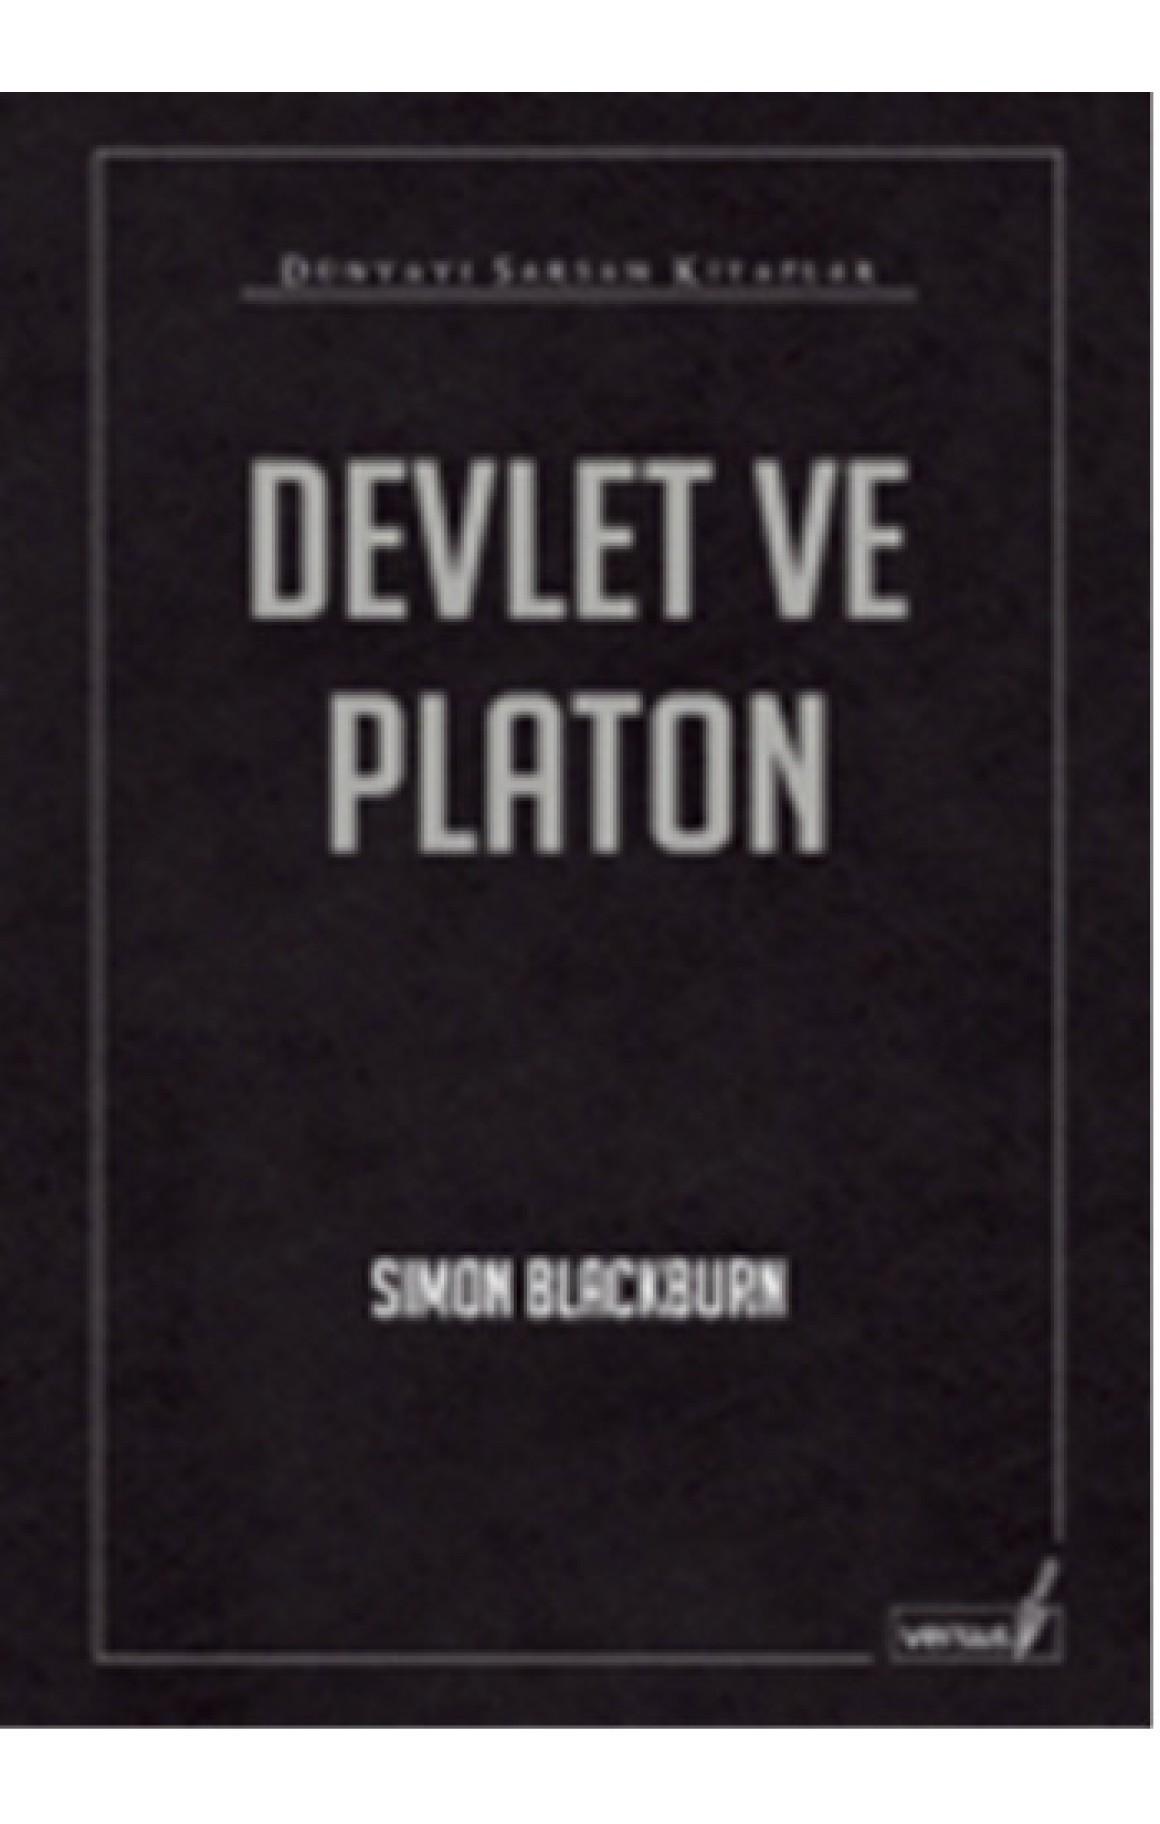 Devlet ve Platon